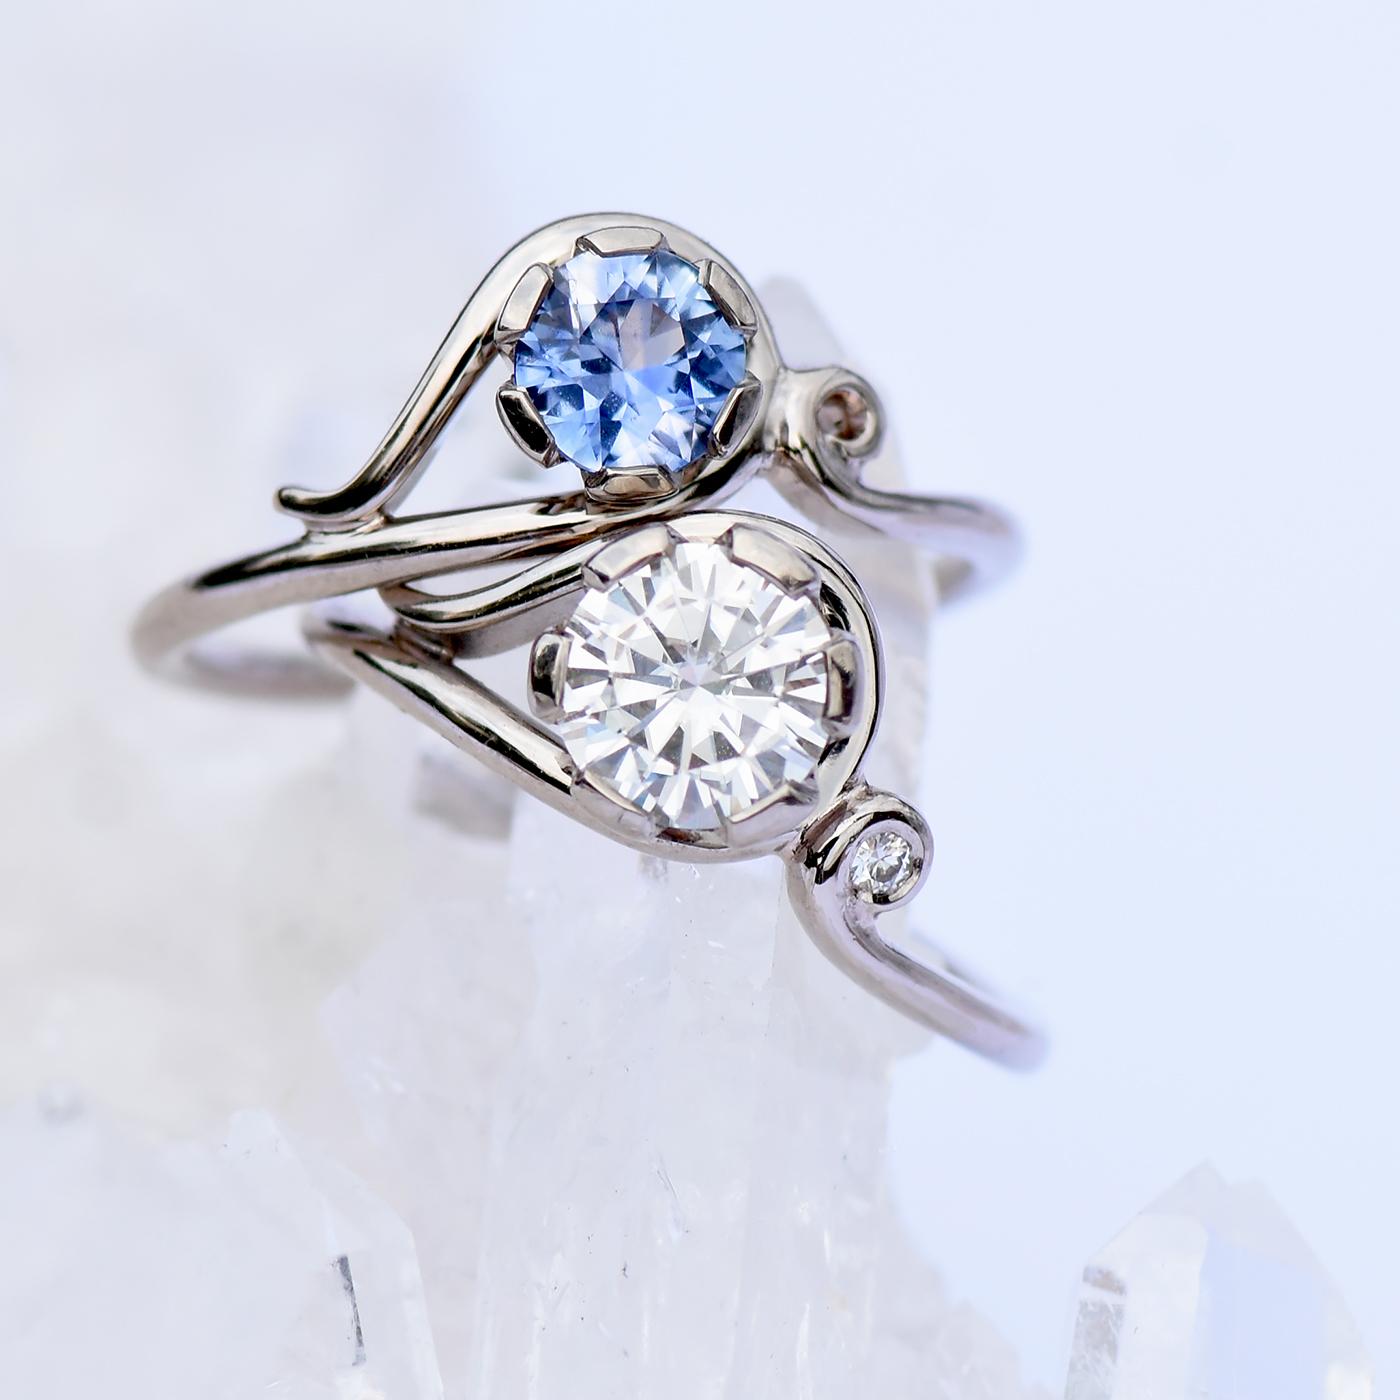 moissanite art nouveau inspired ring gold or platinum lilia nash